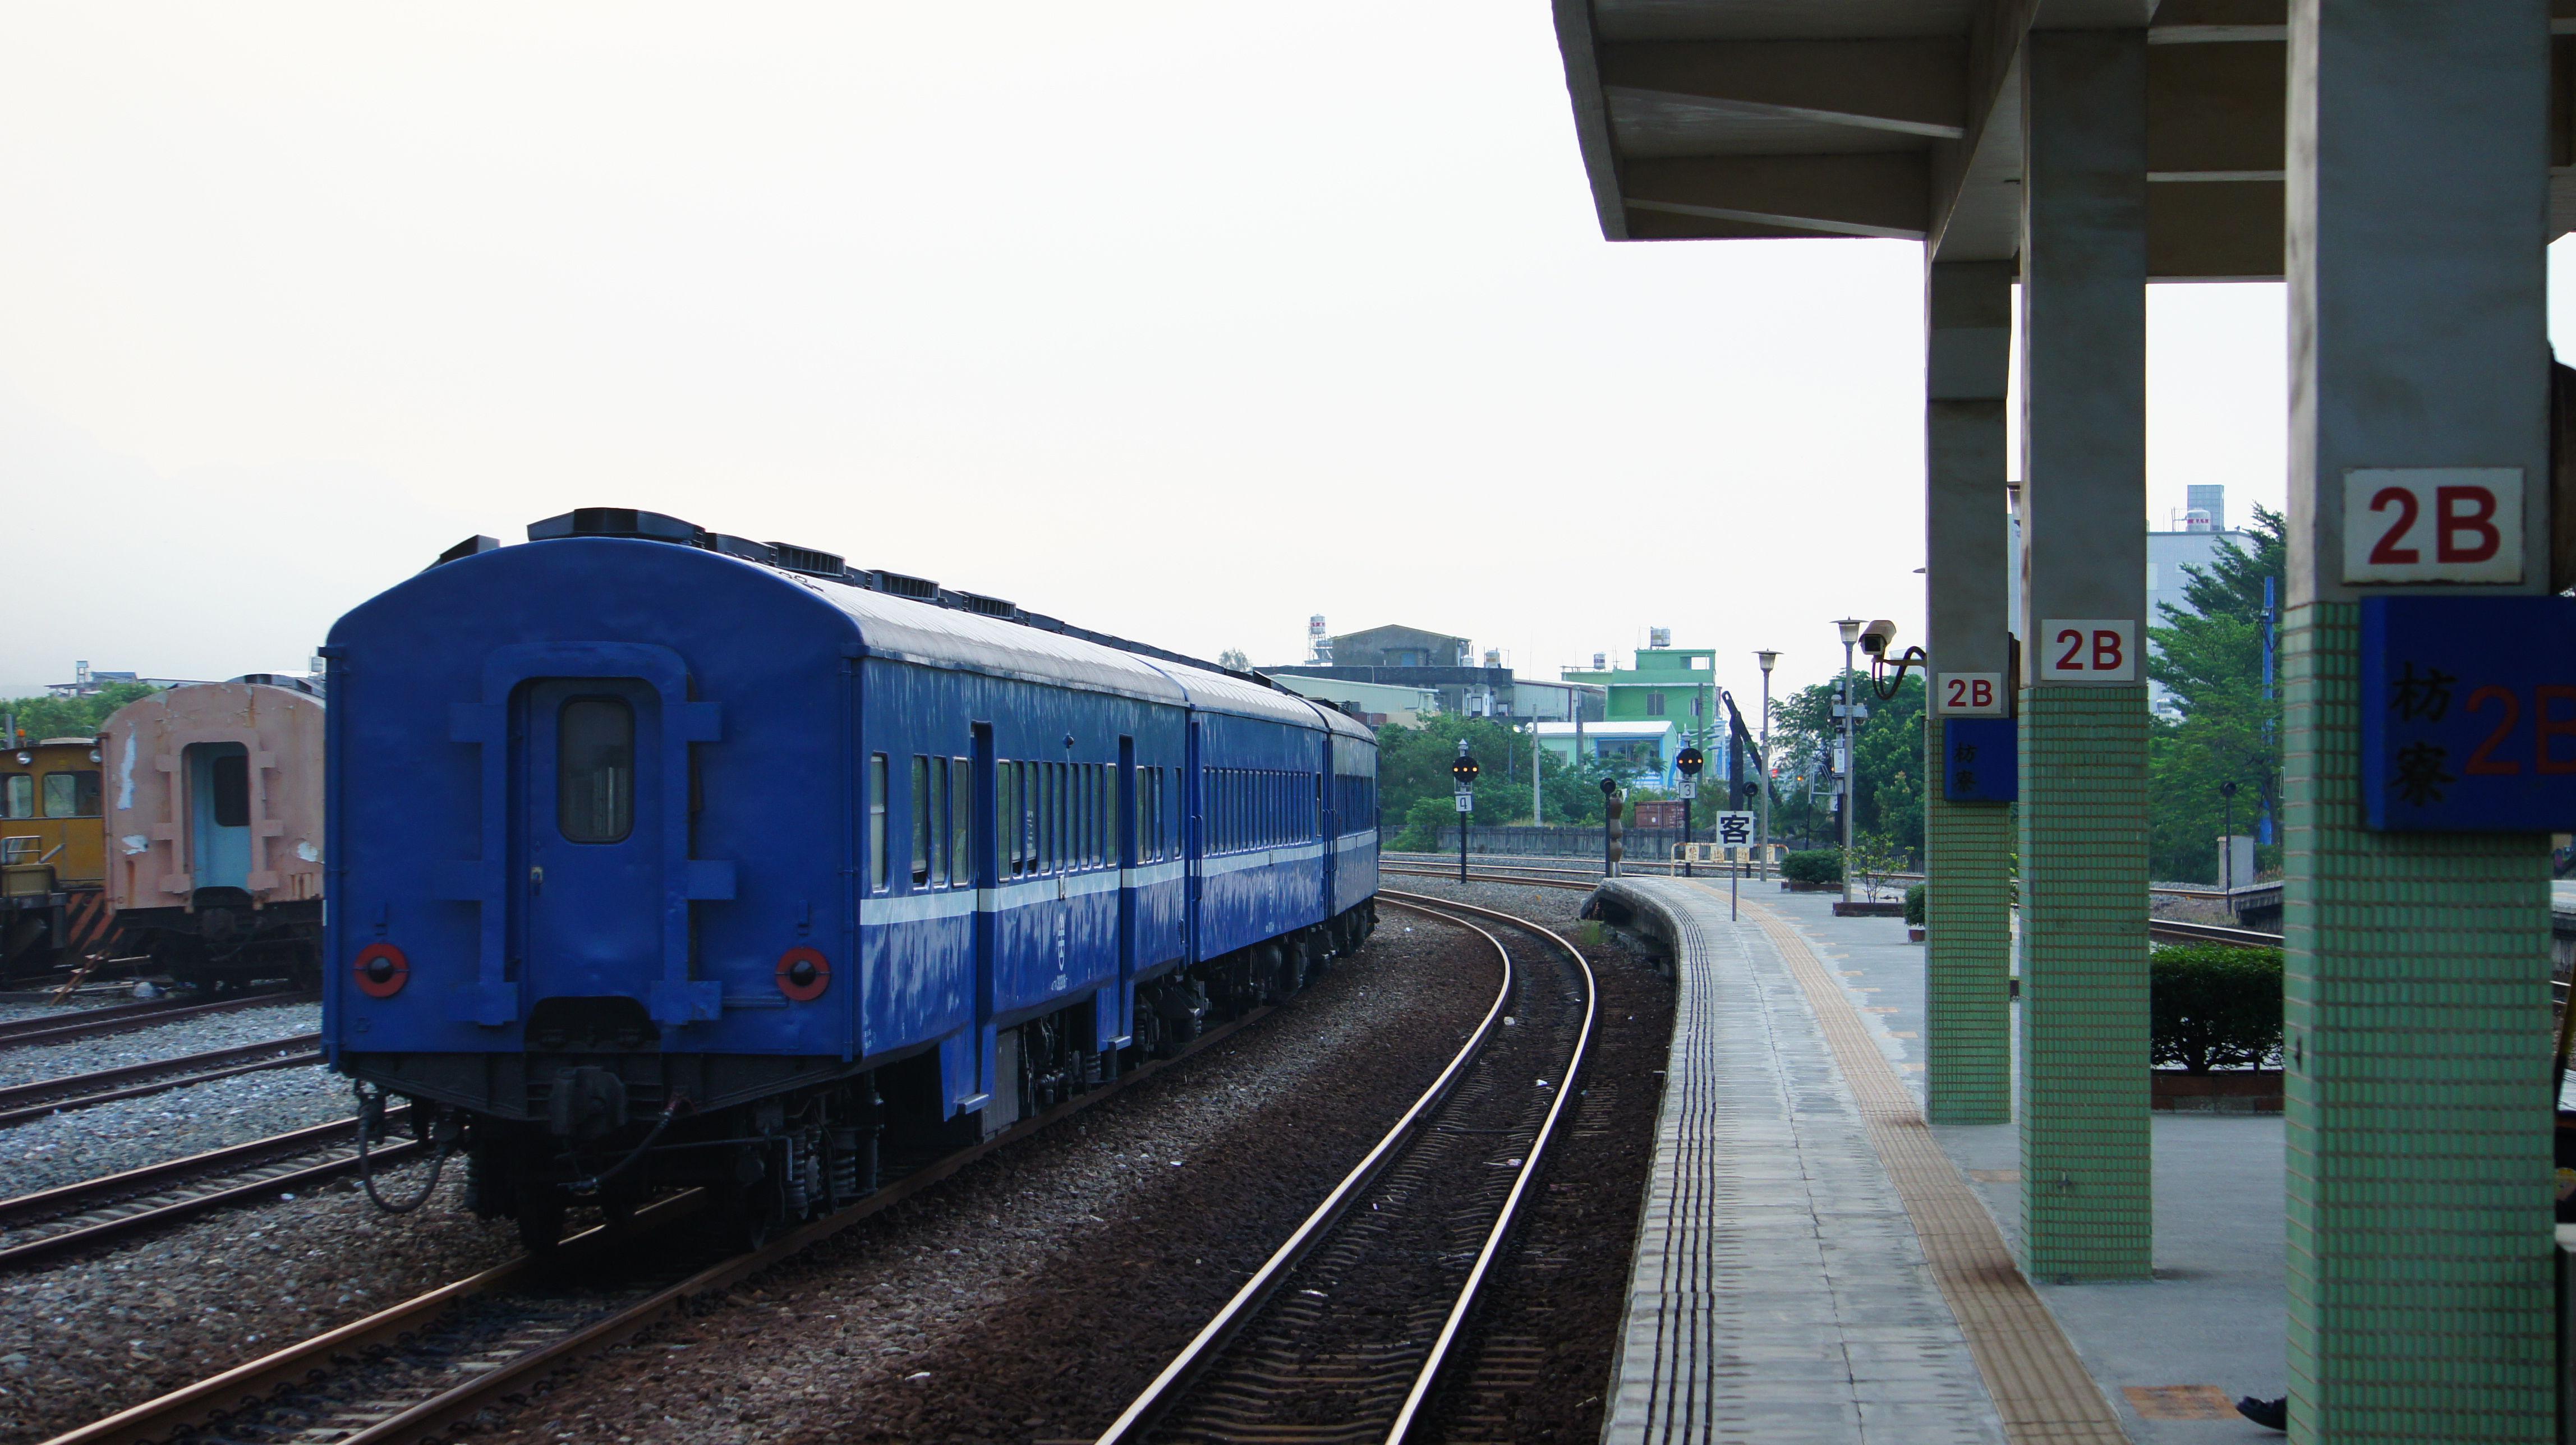 DSC08832.JPG